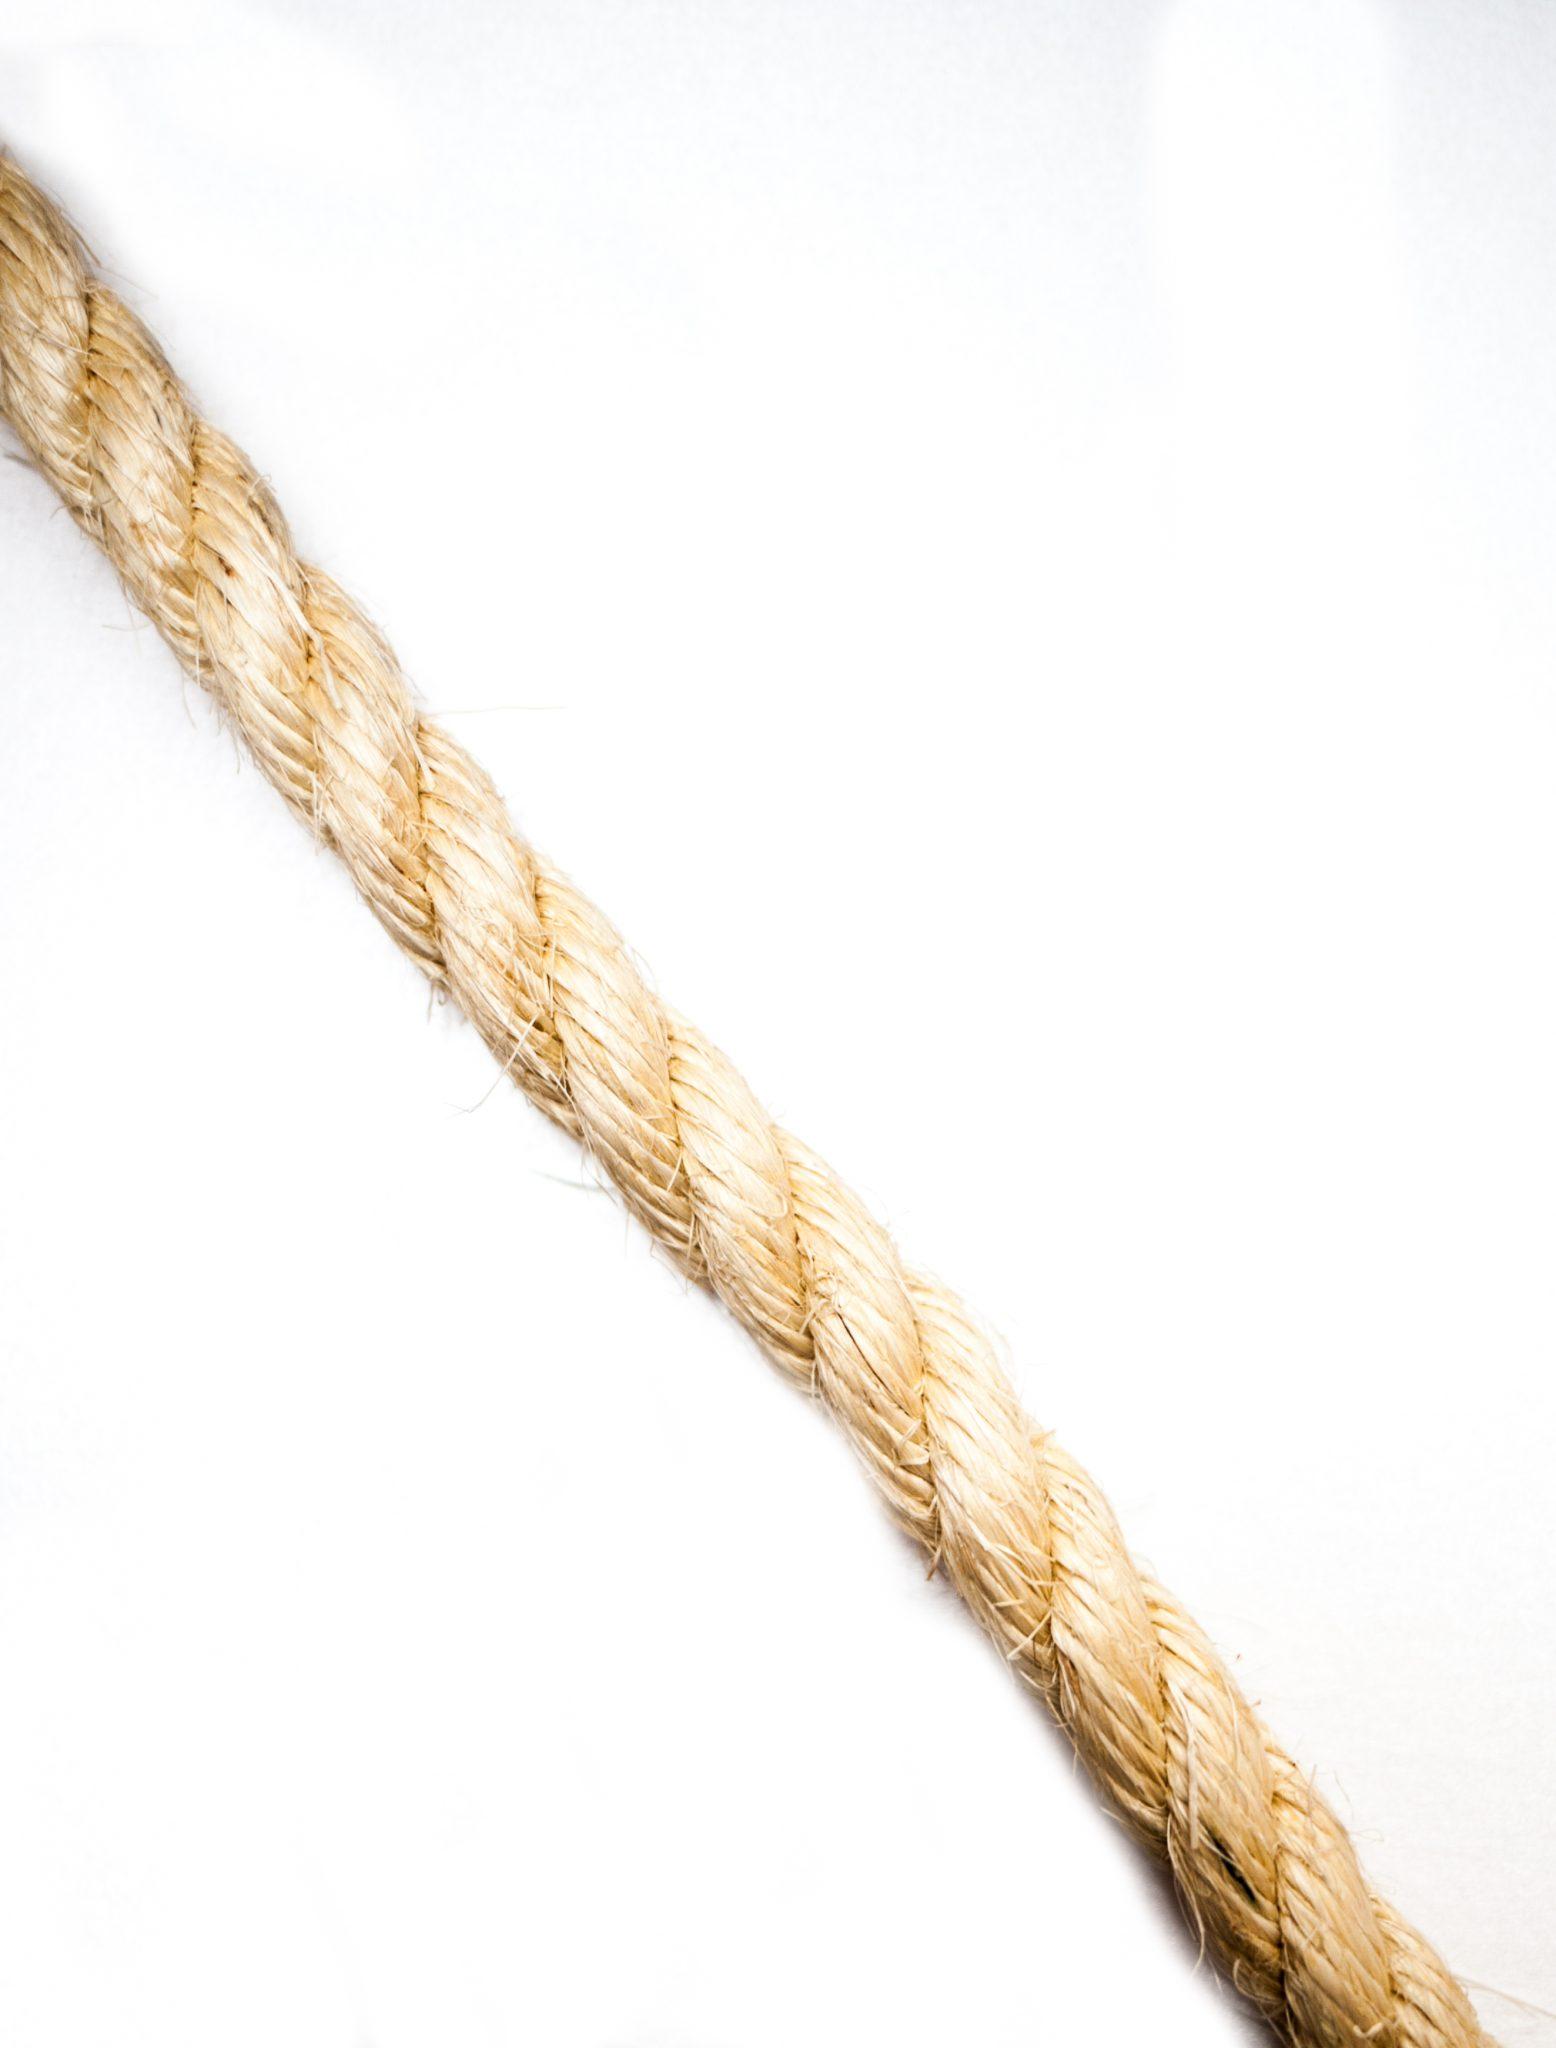 40mm Natural Sisal Rope (Sold by Meter)